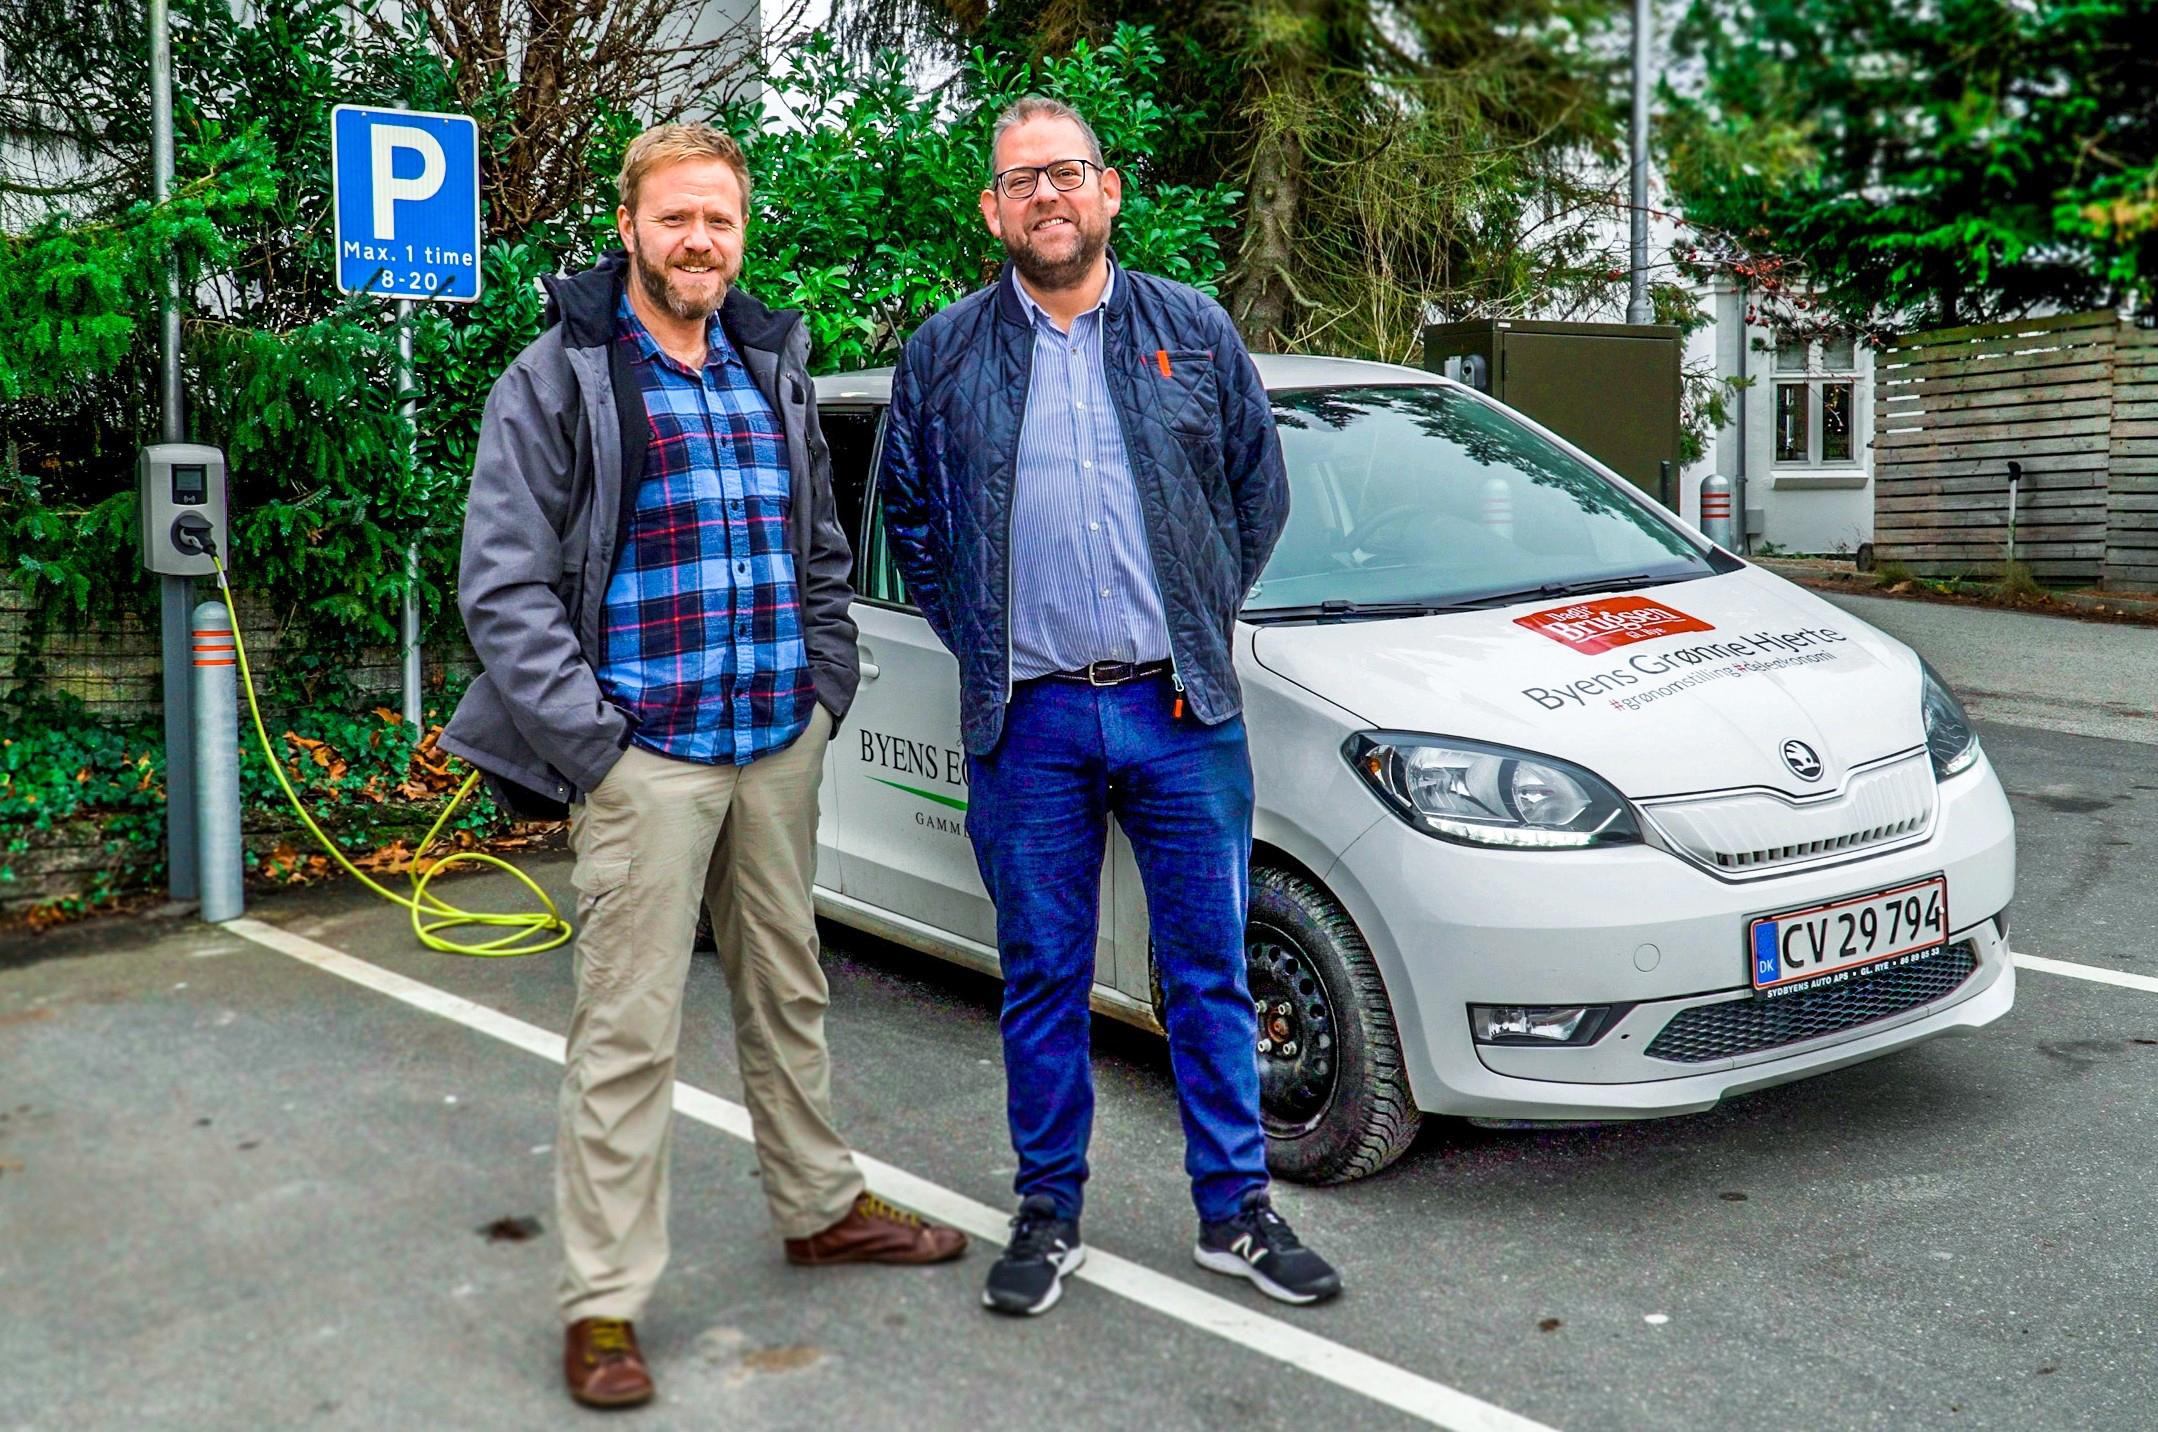 El-delebil_Gl Rye_Pressefoto_fra venstre initiativtager Ole Jeppesen_uddeler Henrik Rasmussen